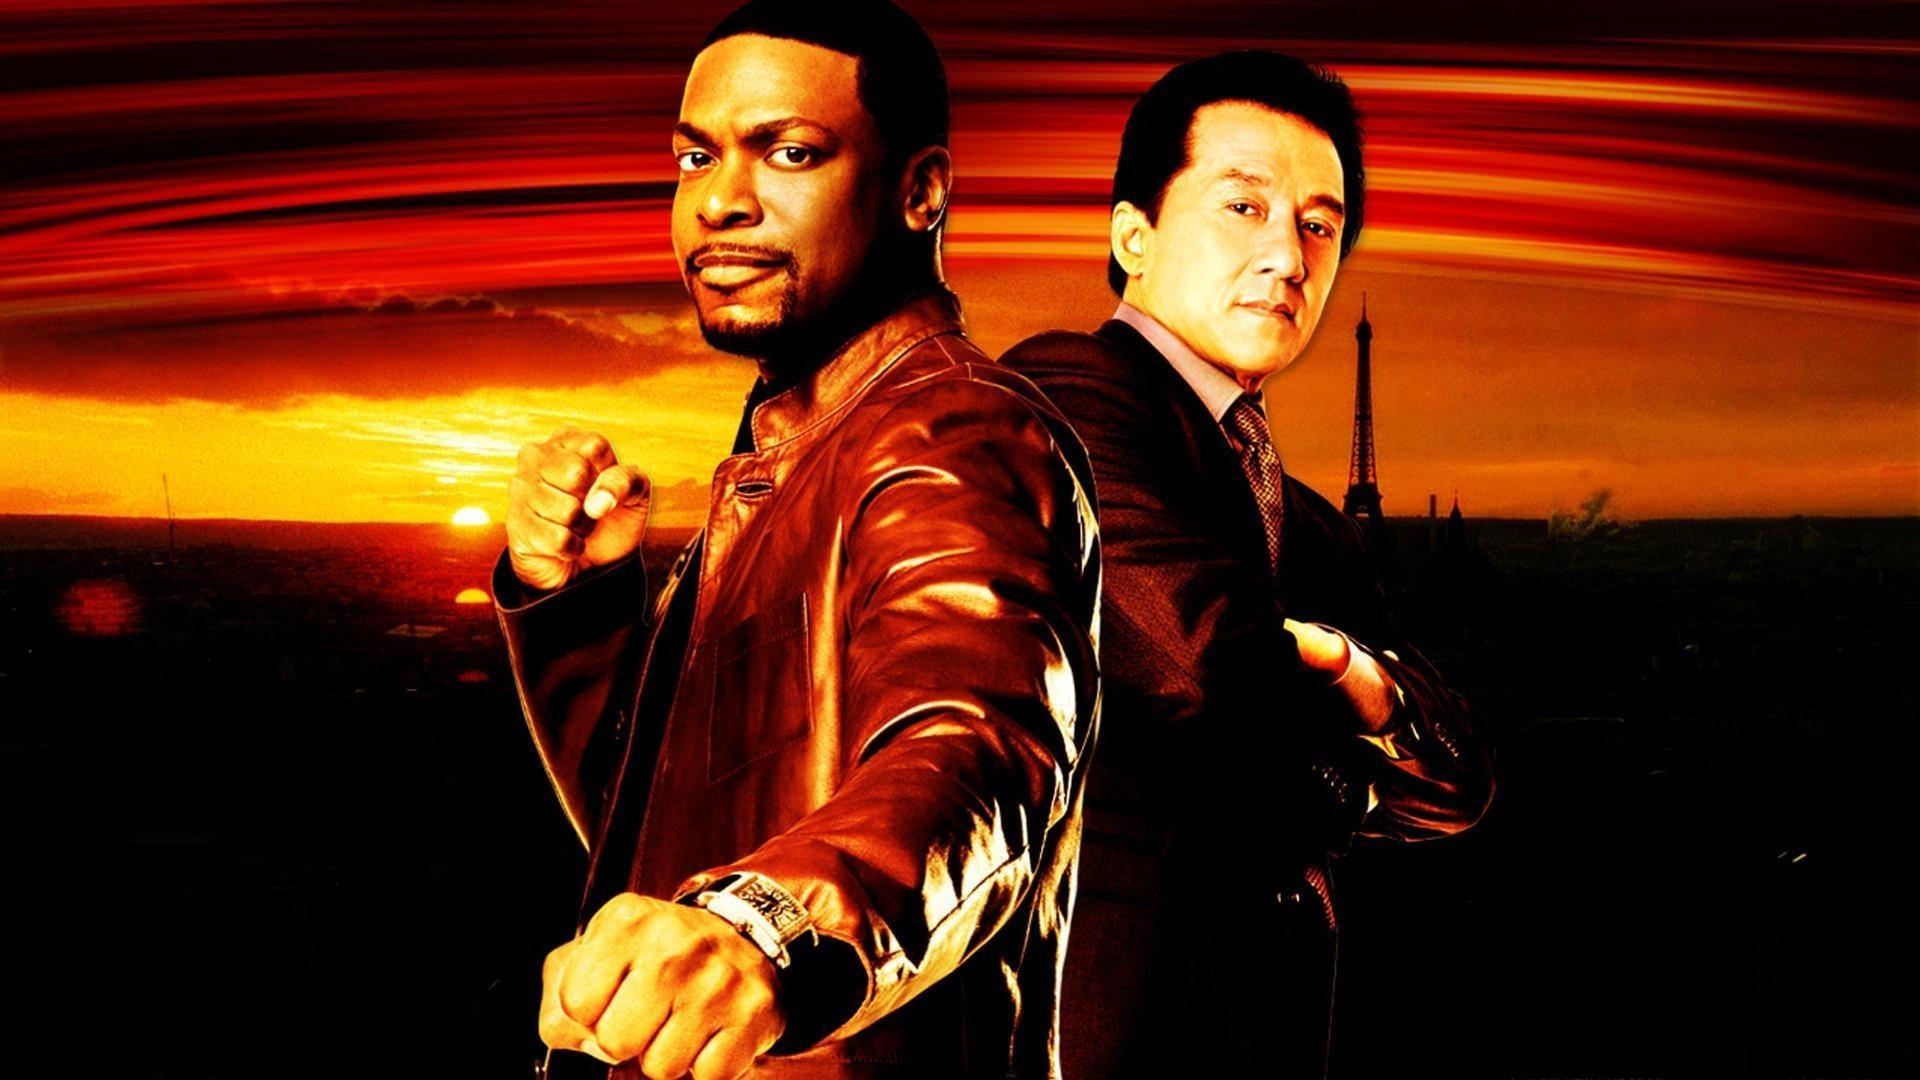 Download Film Rush Hour 3 2007